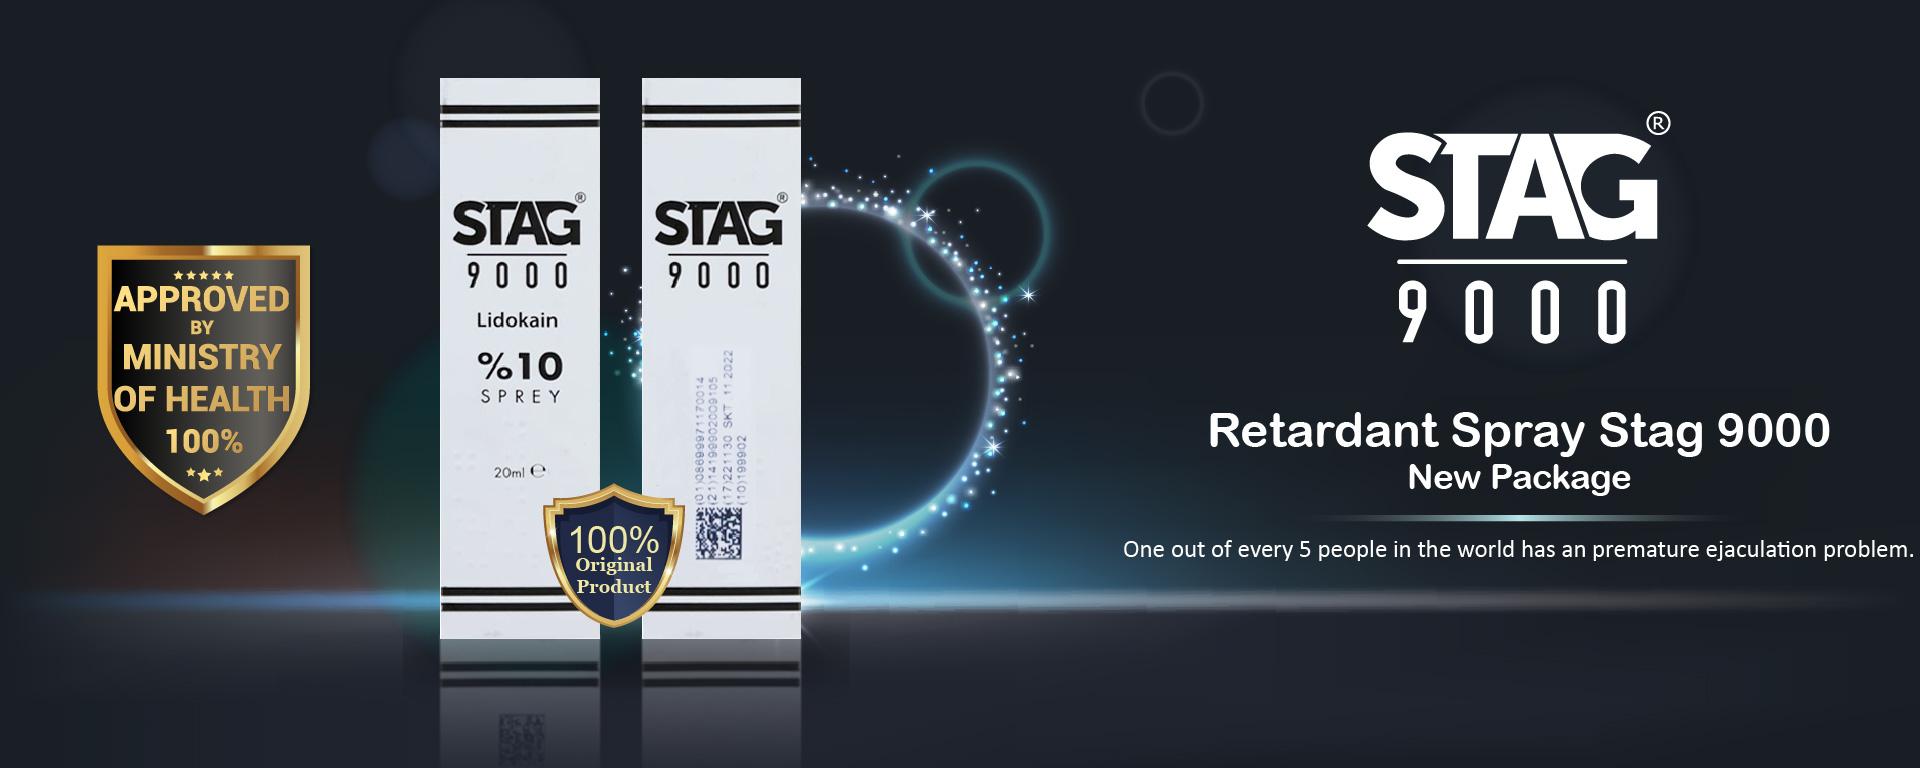 Stag 9000 Retardant Spary